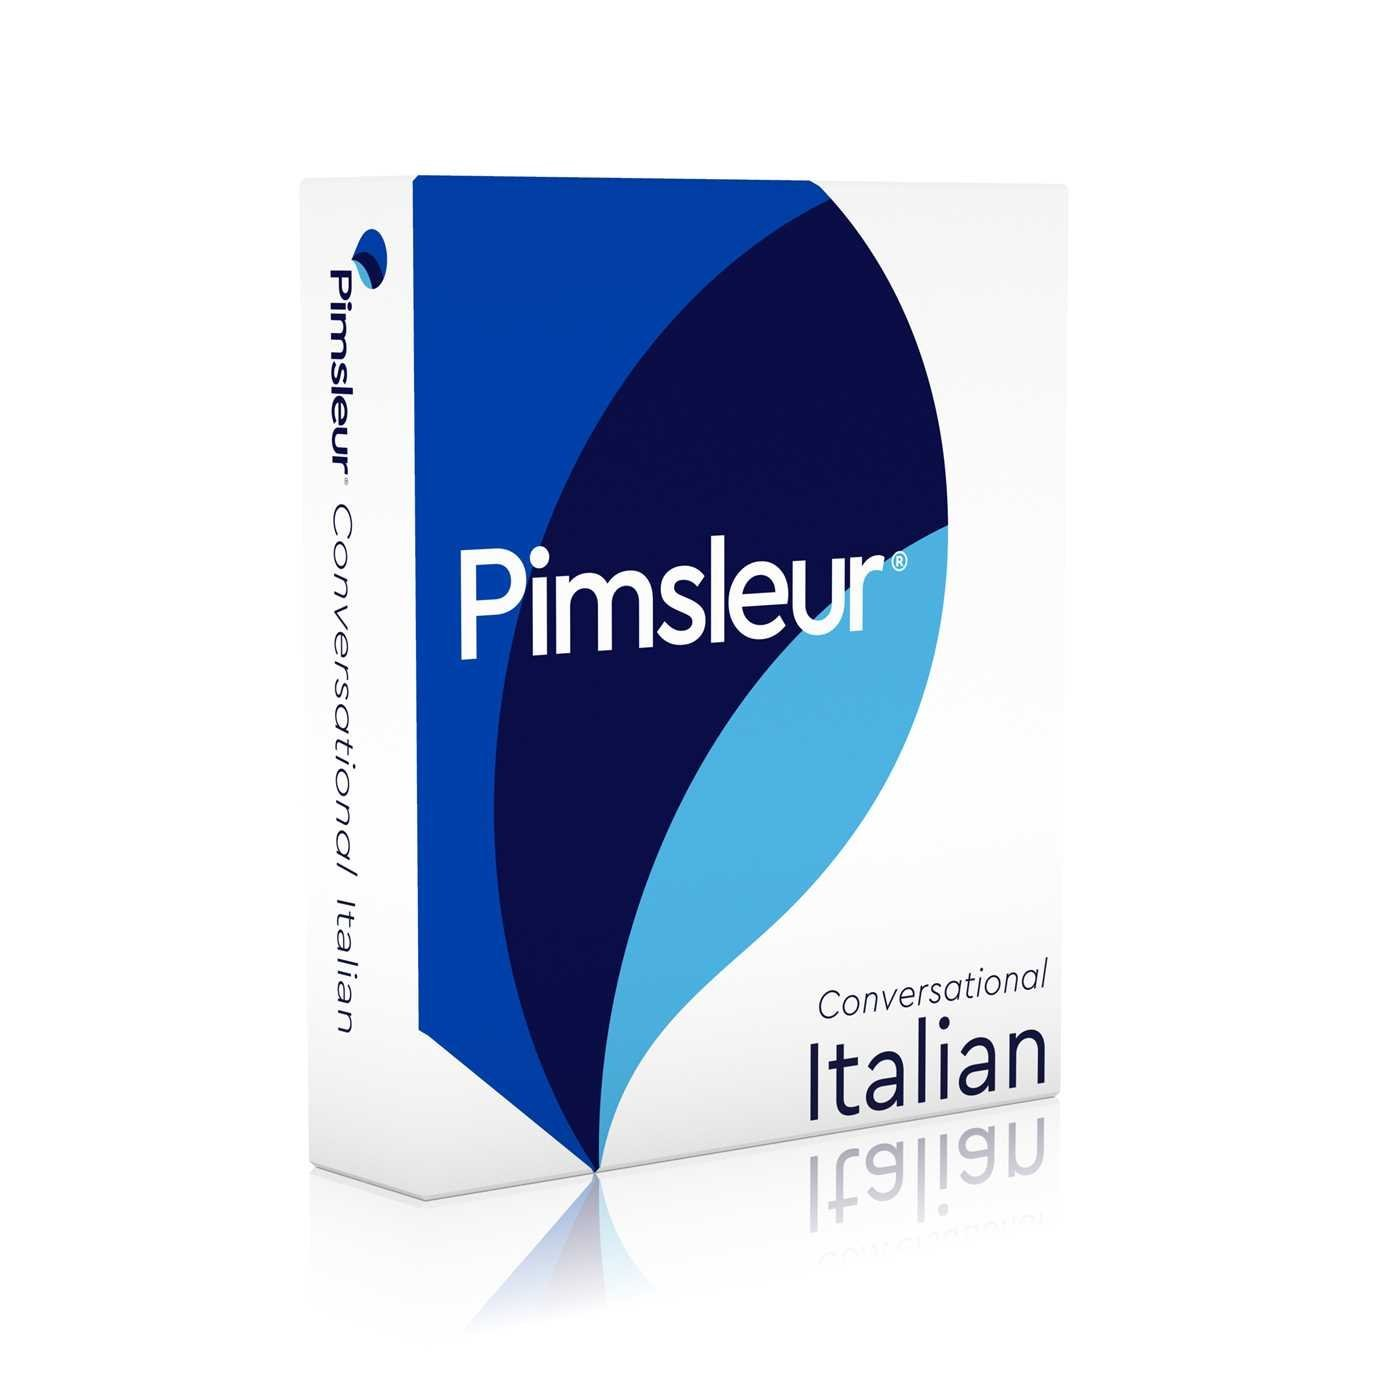 Simon Schusters Pimsleur Conversational Italian Pimsleur